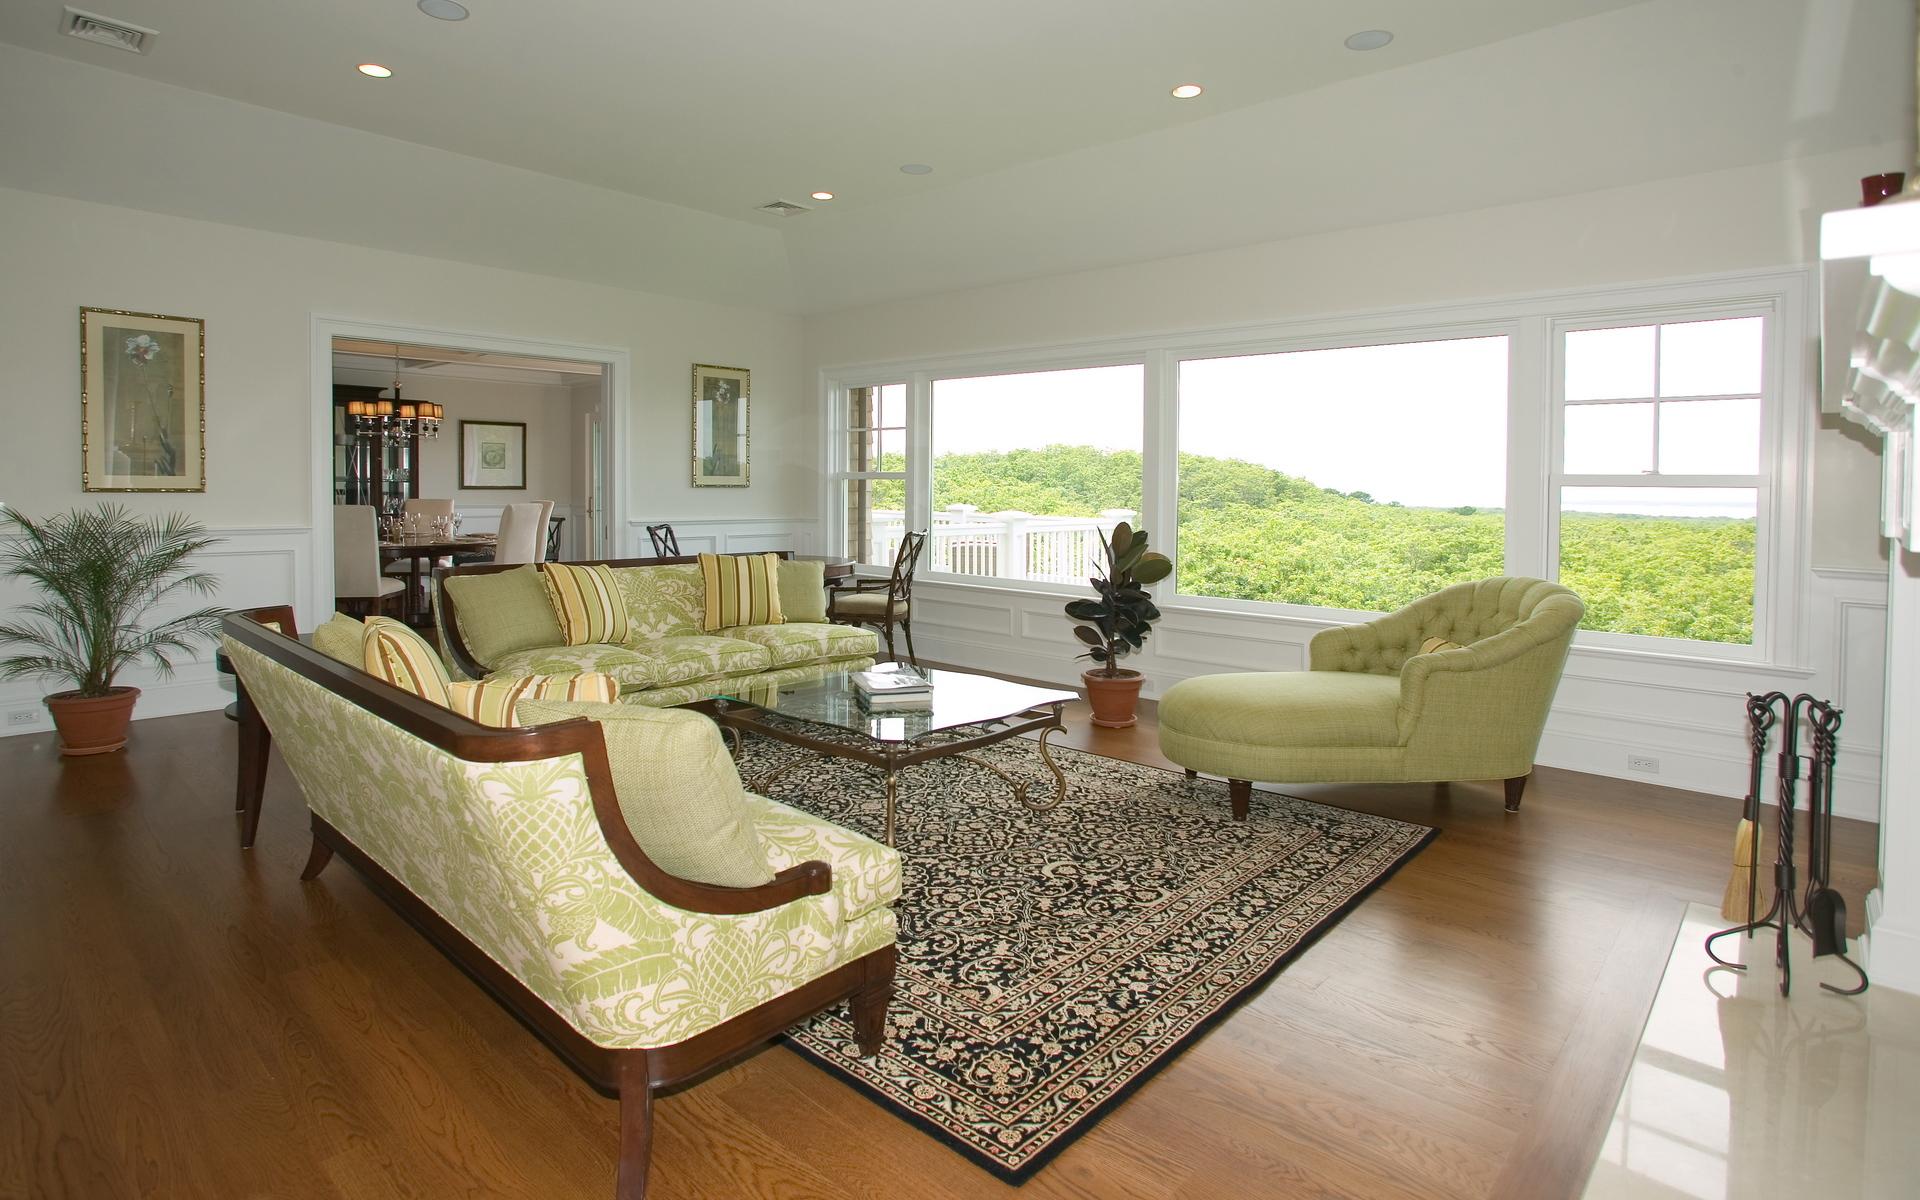 интерьер комната окна диван interior bathroom Windows sofa  № 3530273 бесплатно